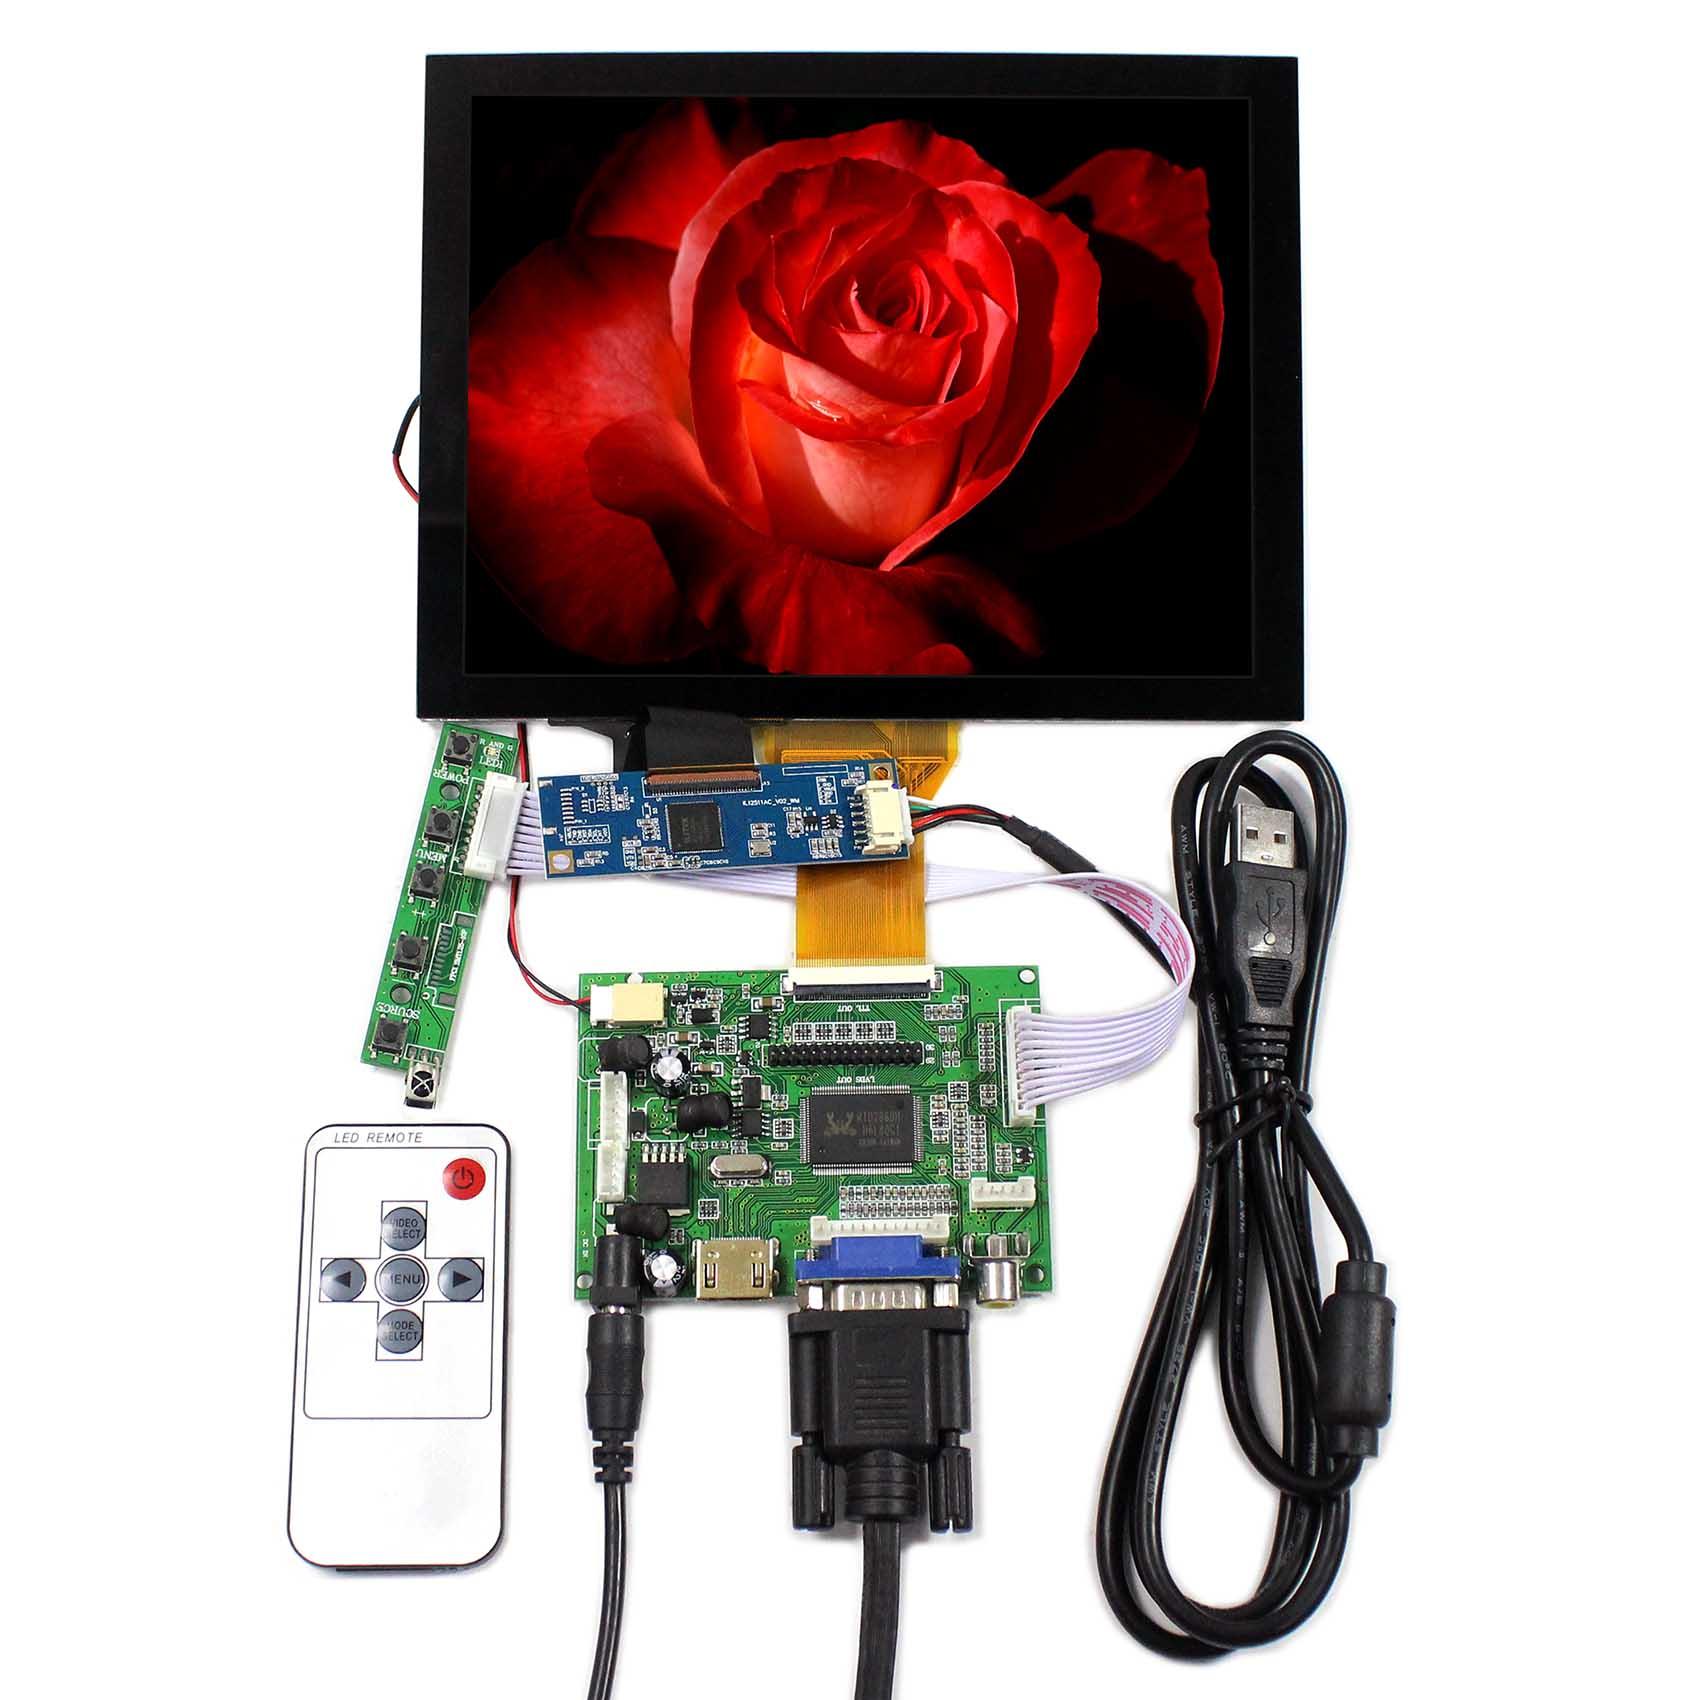 HDMI VGA 2AV LCD Controller Board Capacitive Touch Panel VS-TY2662-V1 8inch LCD Screen EJ080NA-05A Backlight WLED VS080TC-A1HDMI VGA 2AV LCD Controller Board Capacitive Touch Panel VS-TY2662-V1 8inch LCD Screen EJ080NA-05A Backlight WLED VS080TC-A1